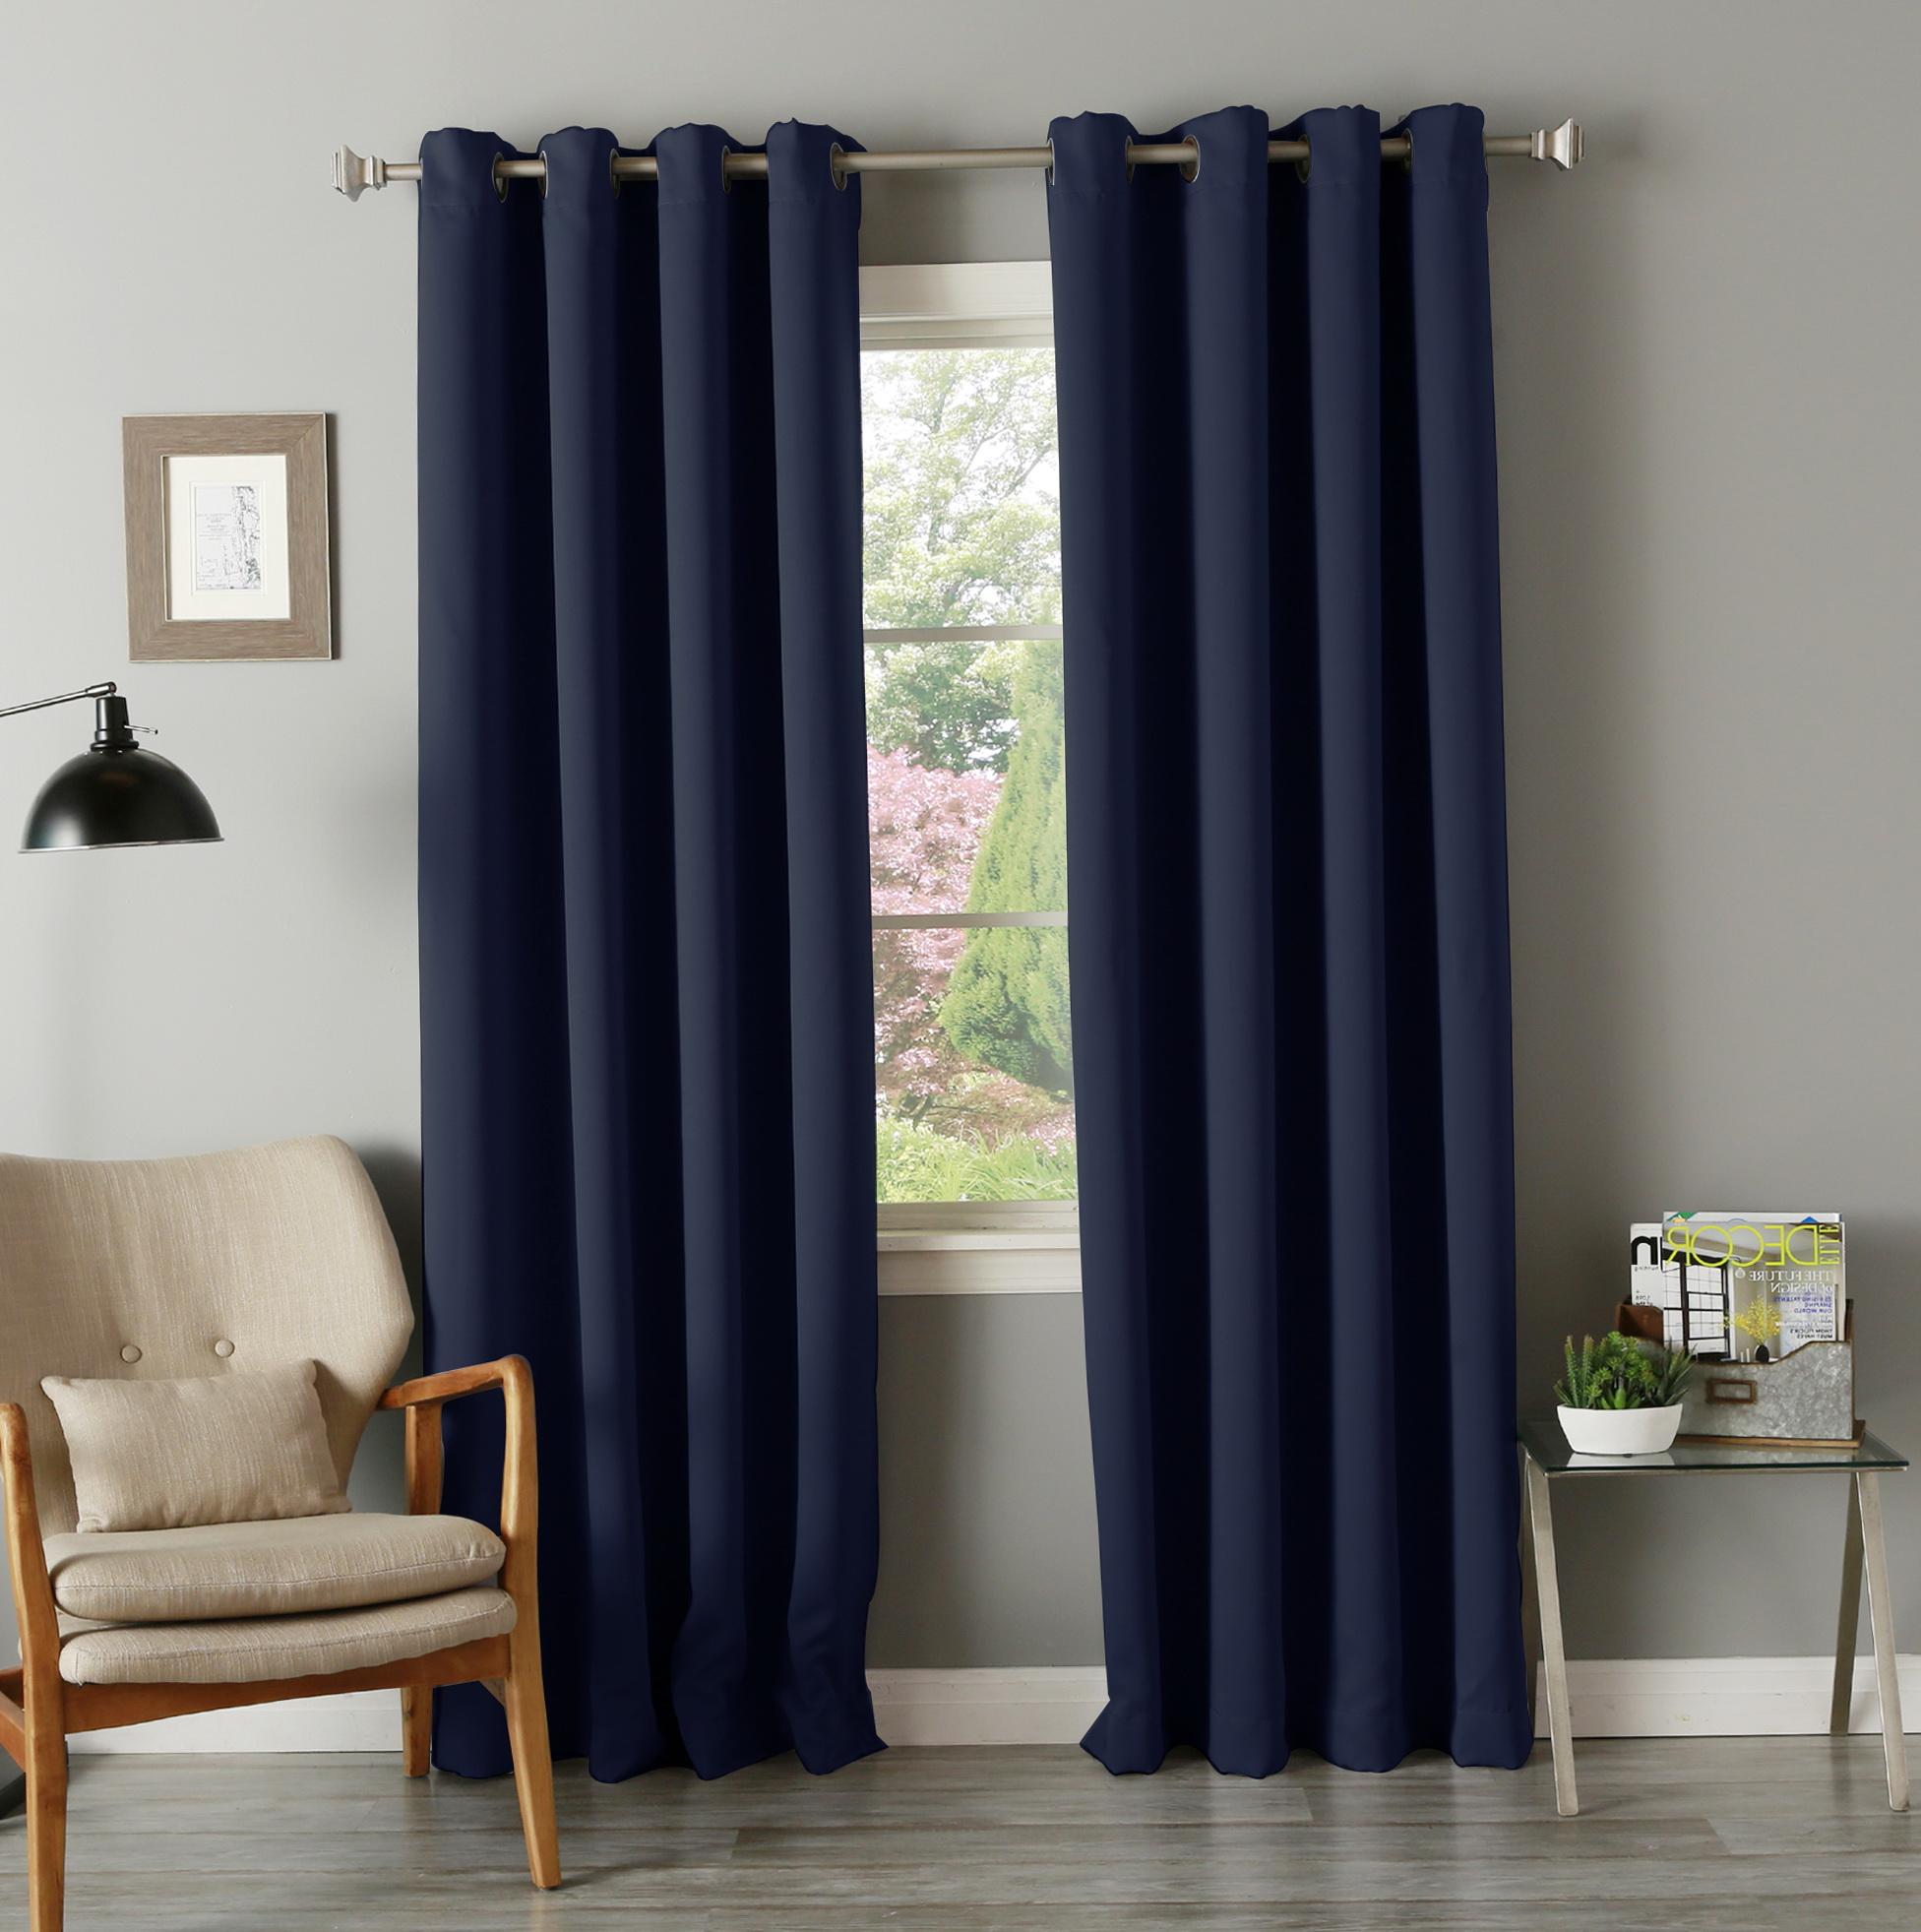 Grommet Top Curtains 63 Inch Home Design Ideas